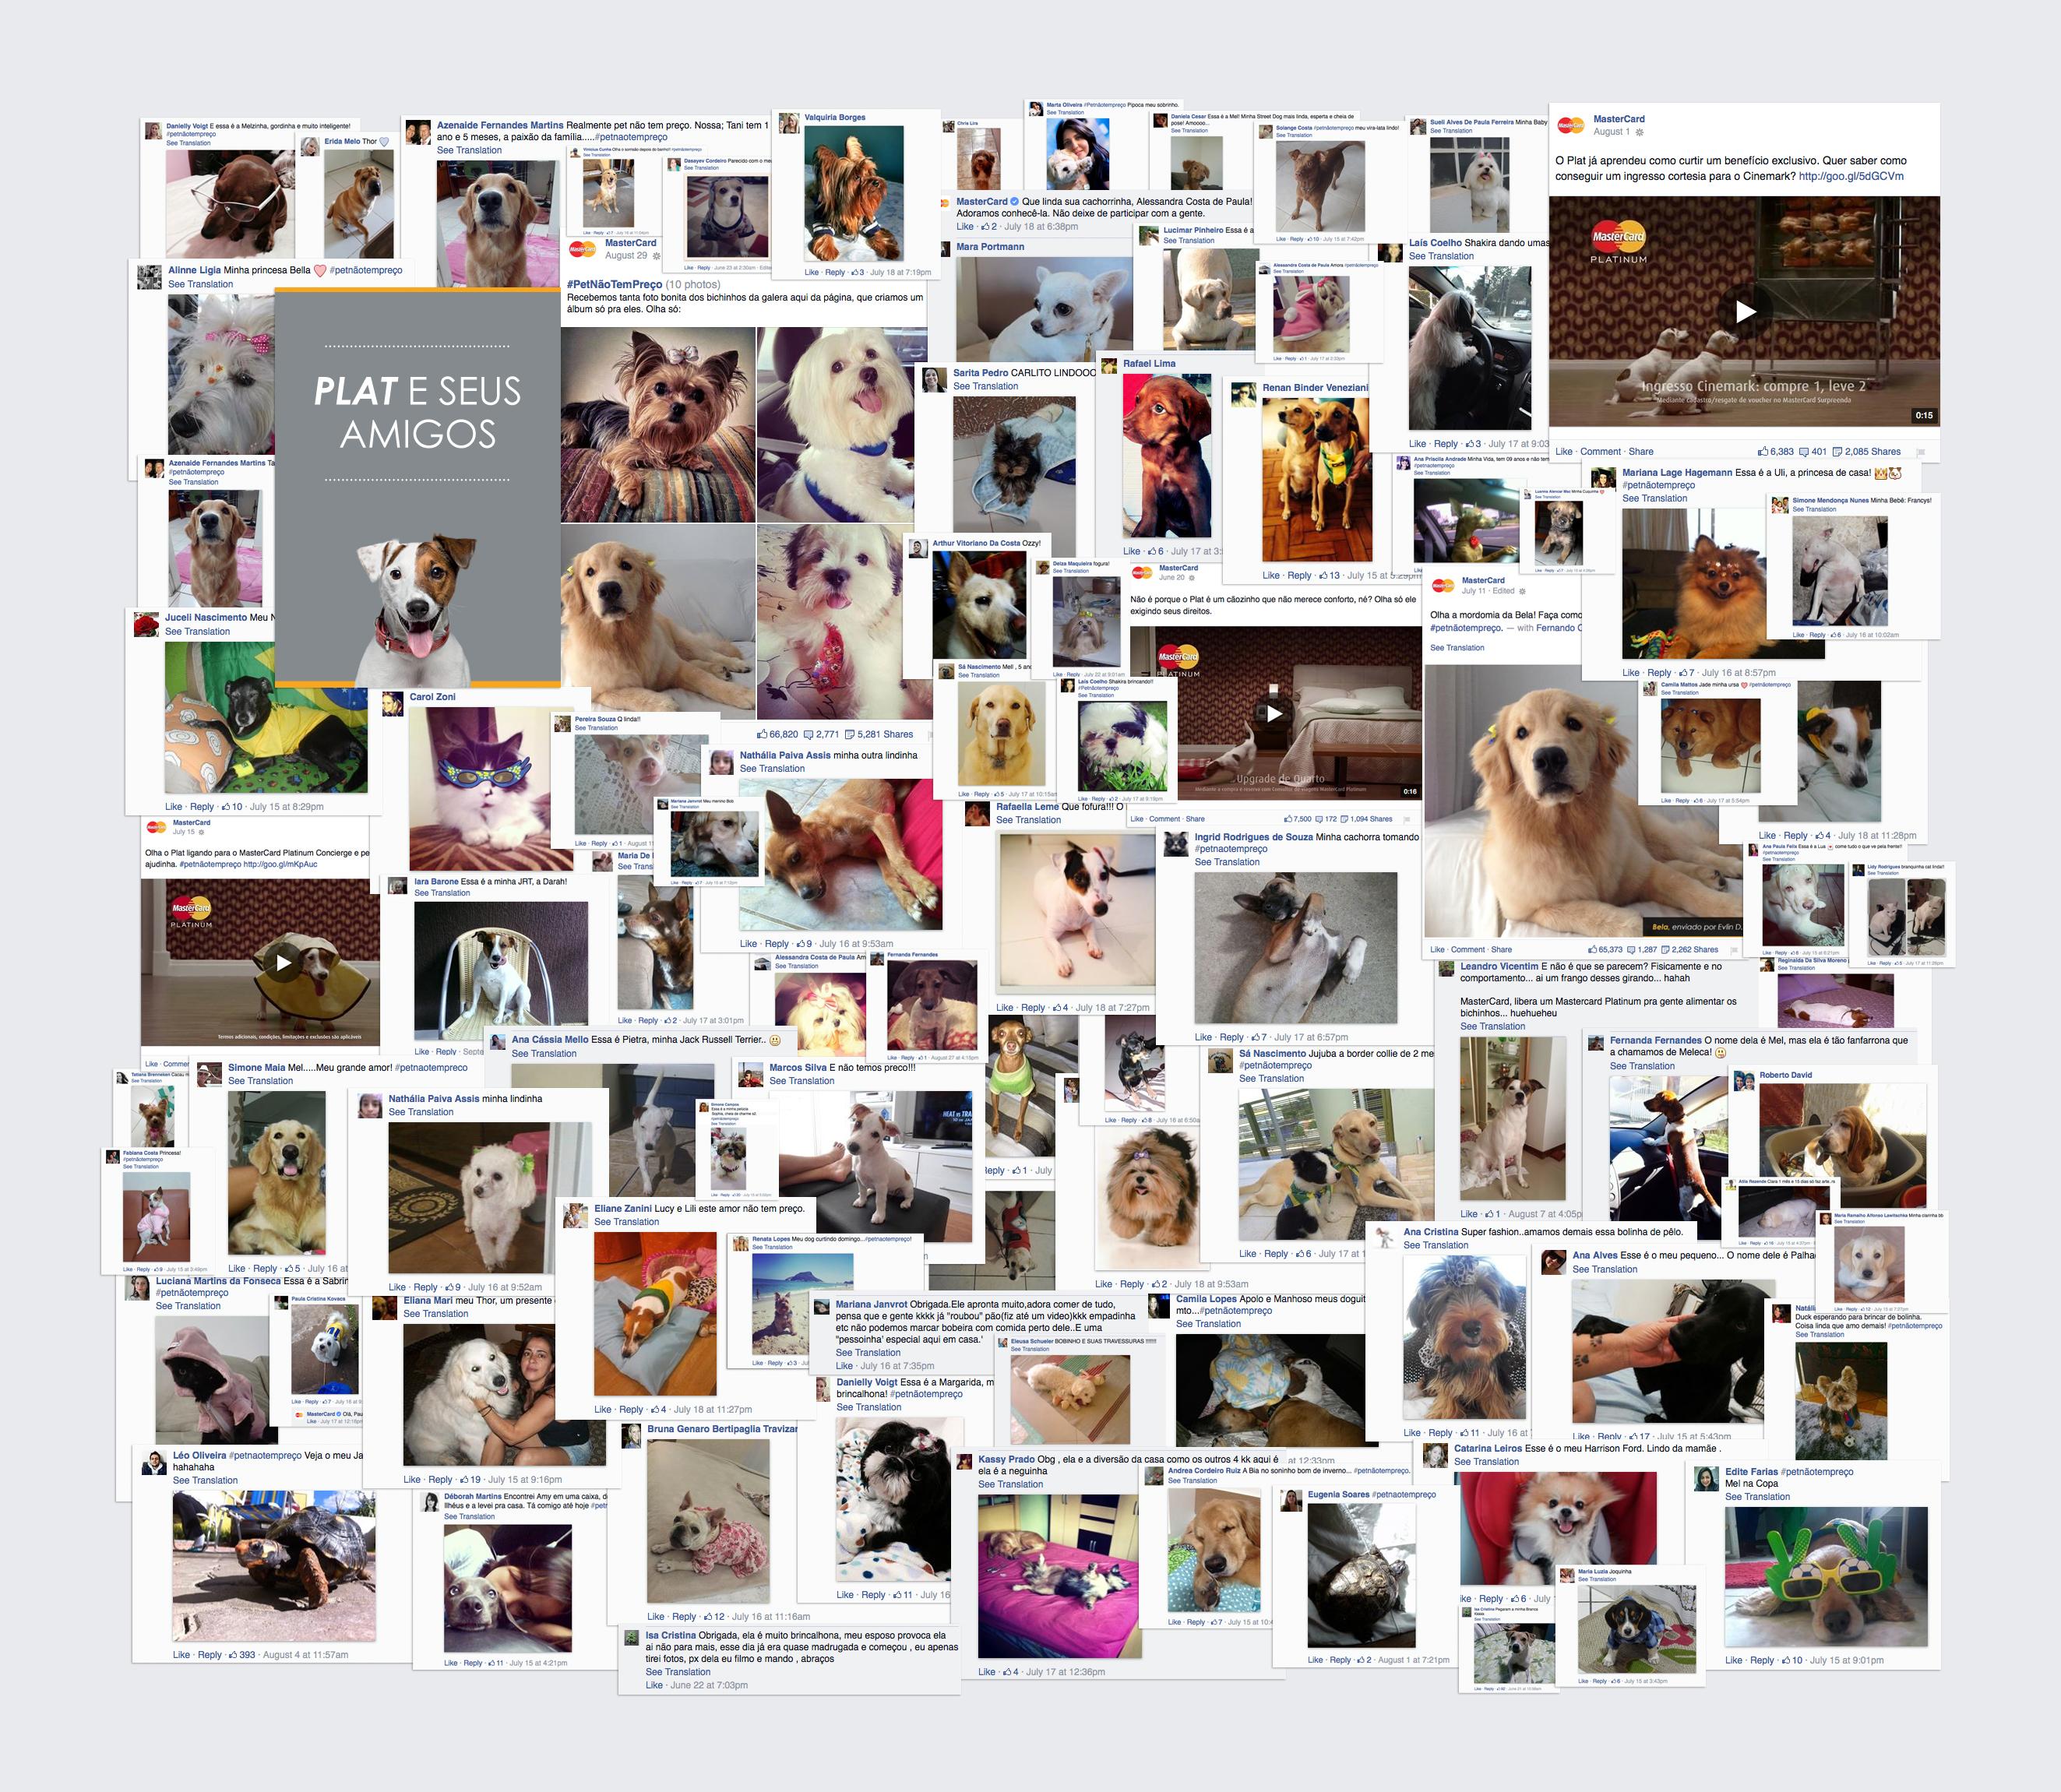 dogs enviados